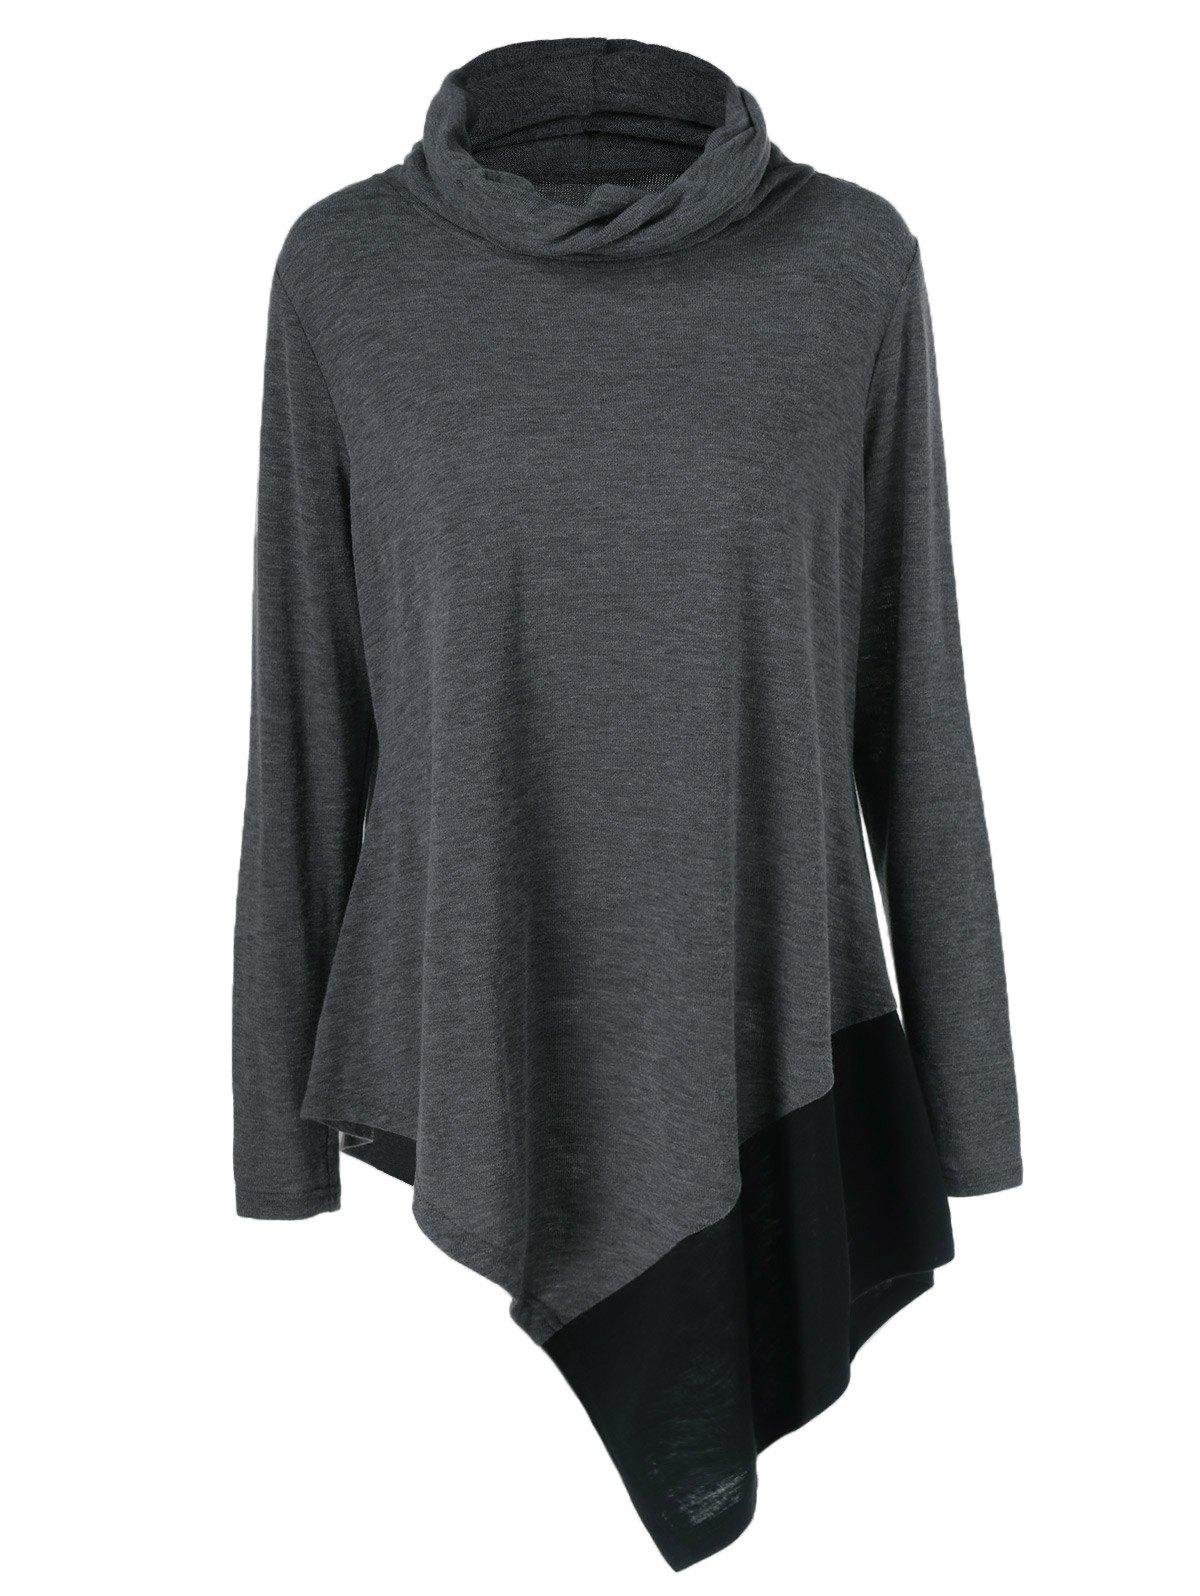 Plus Size Cowl Neck Asymmetrical Pullover